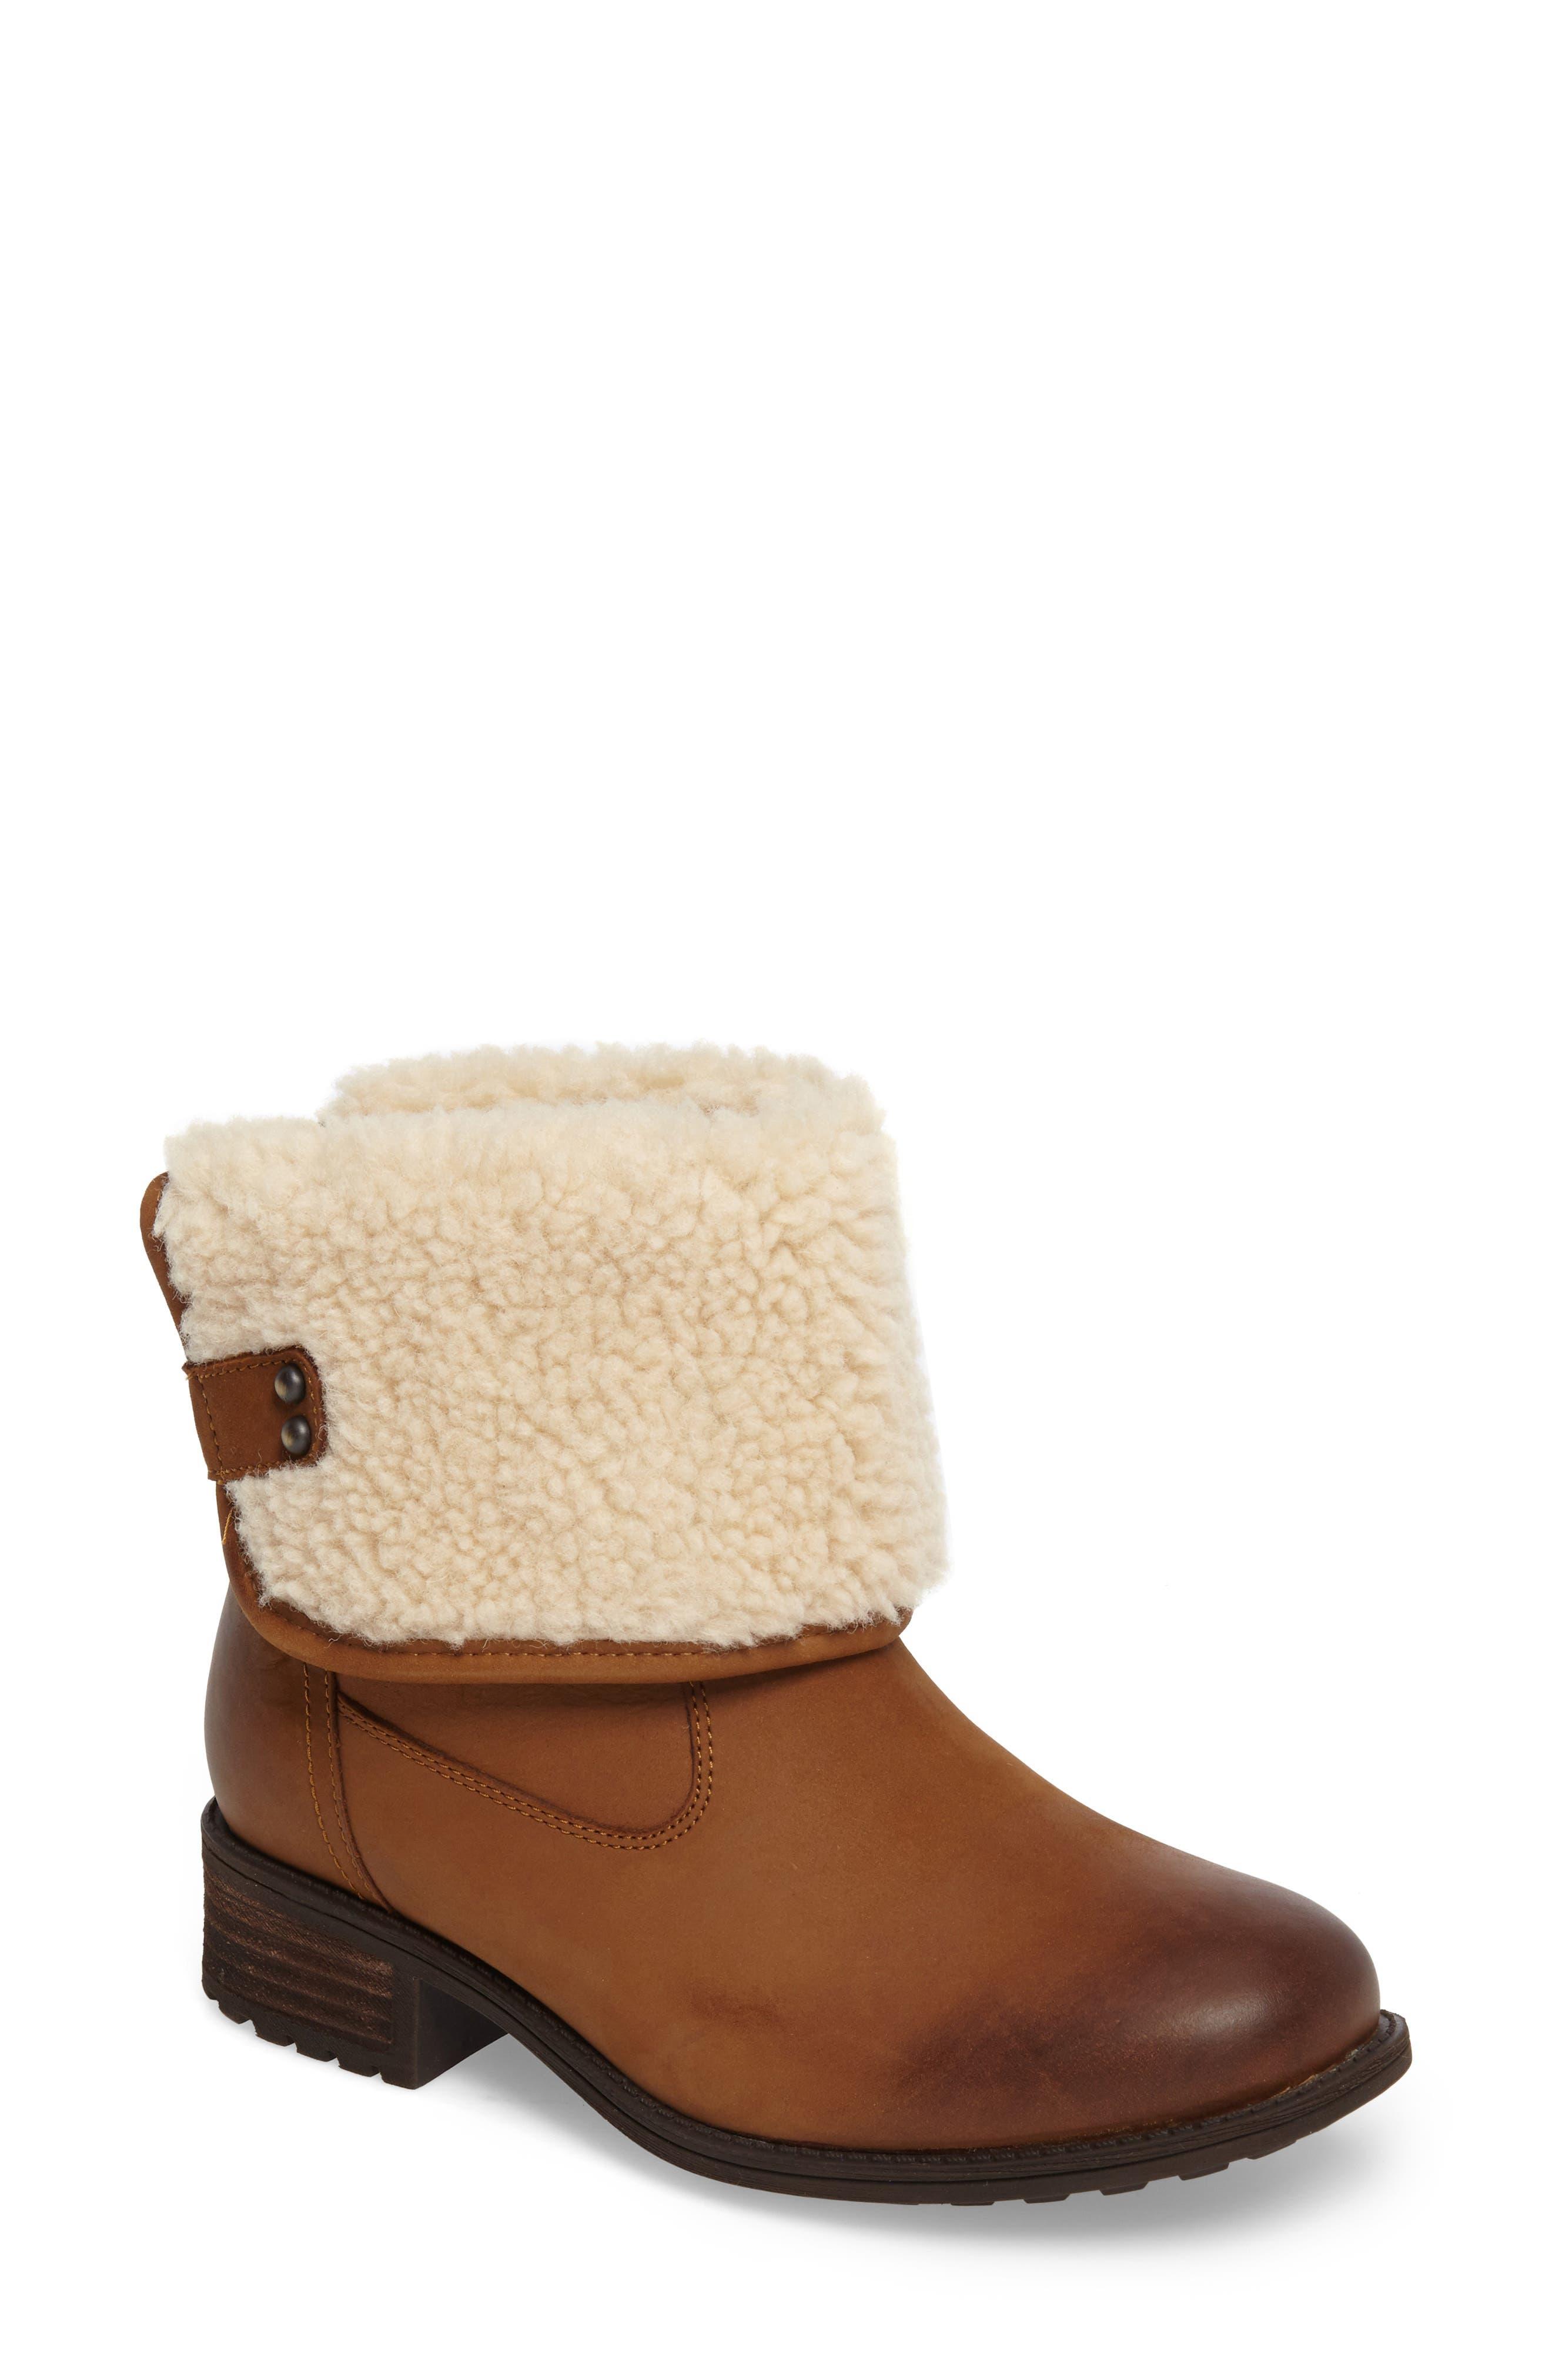 Alternate Image 1 Selected - UGG® Aldon Boot (Women)